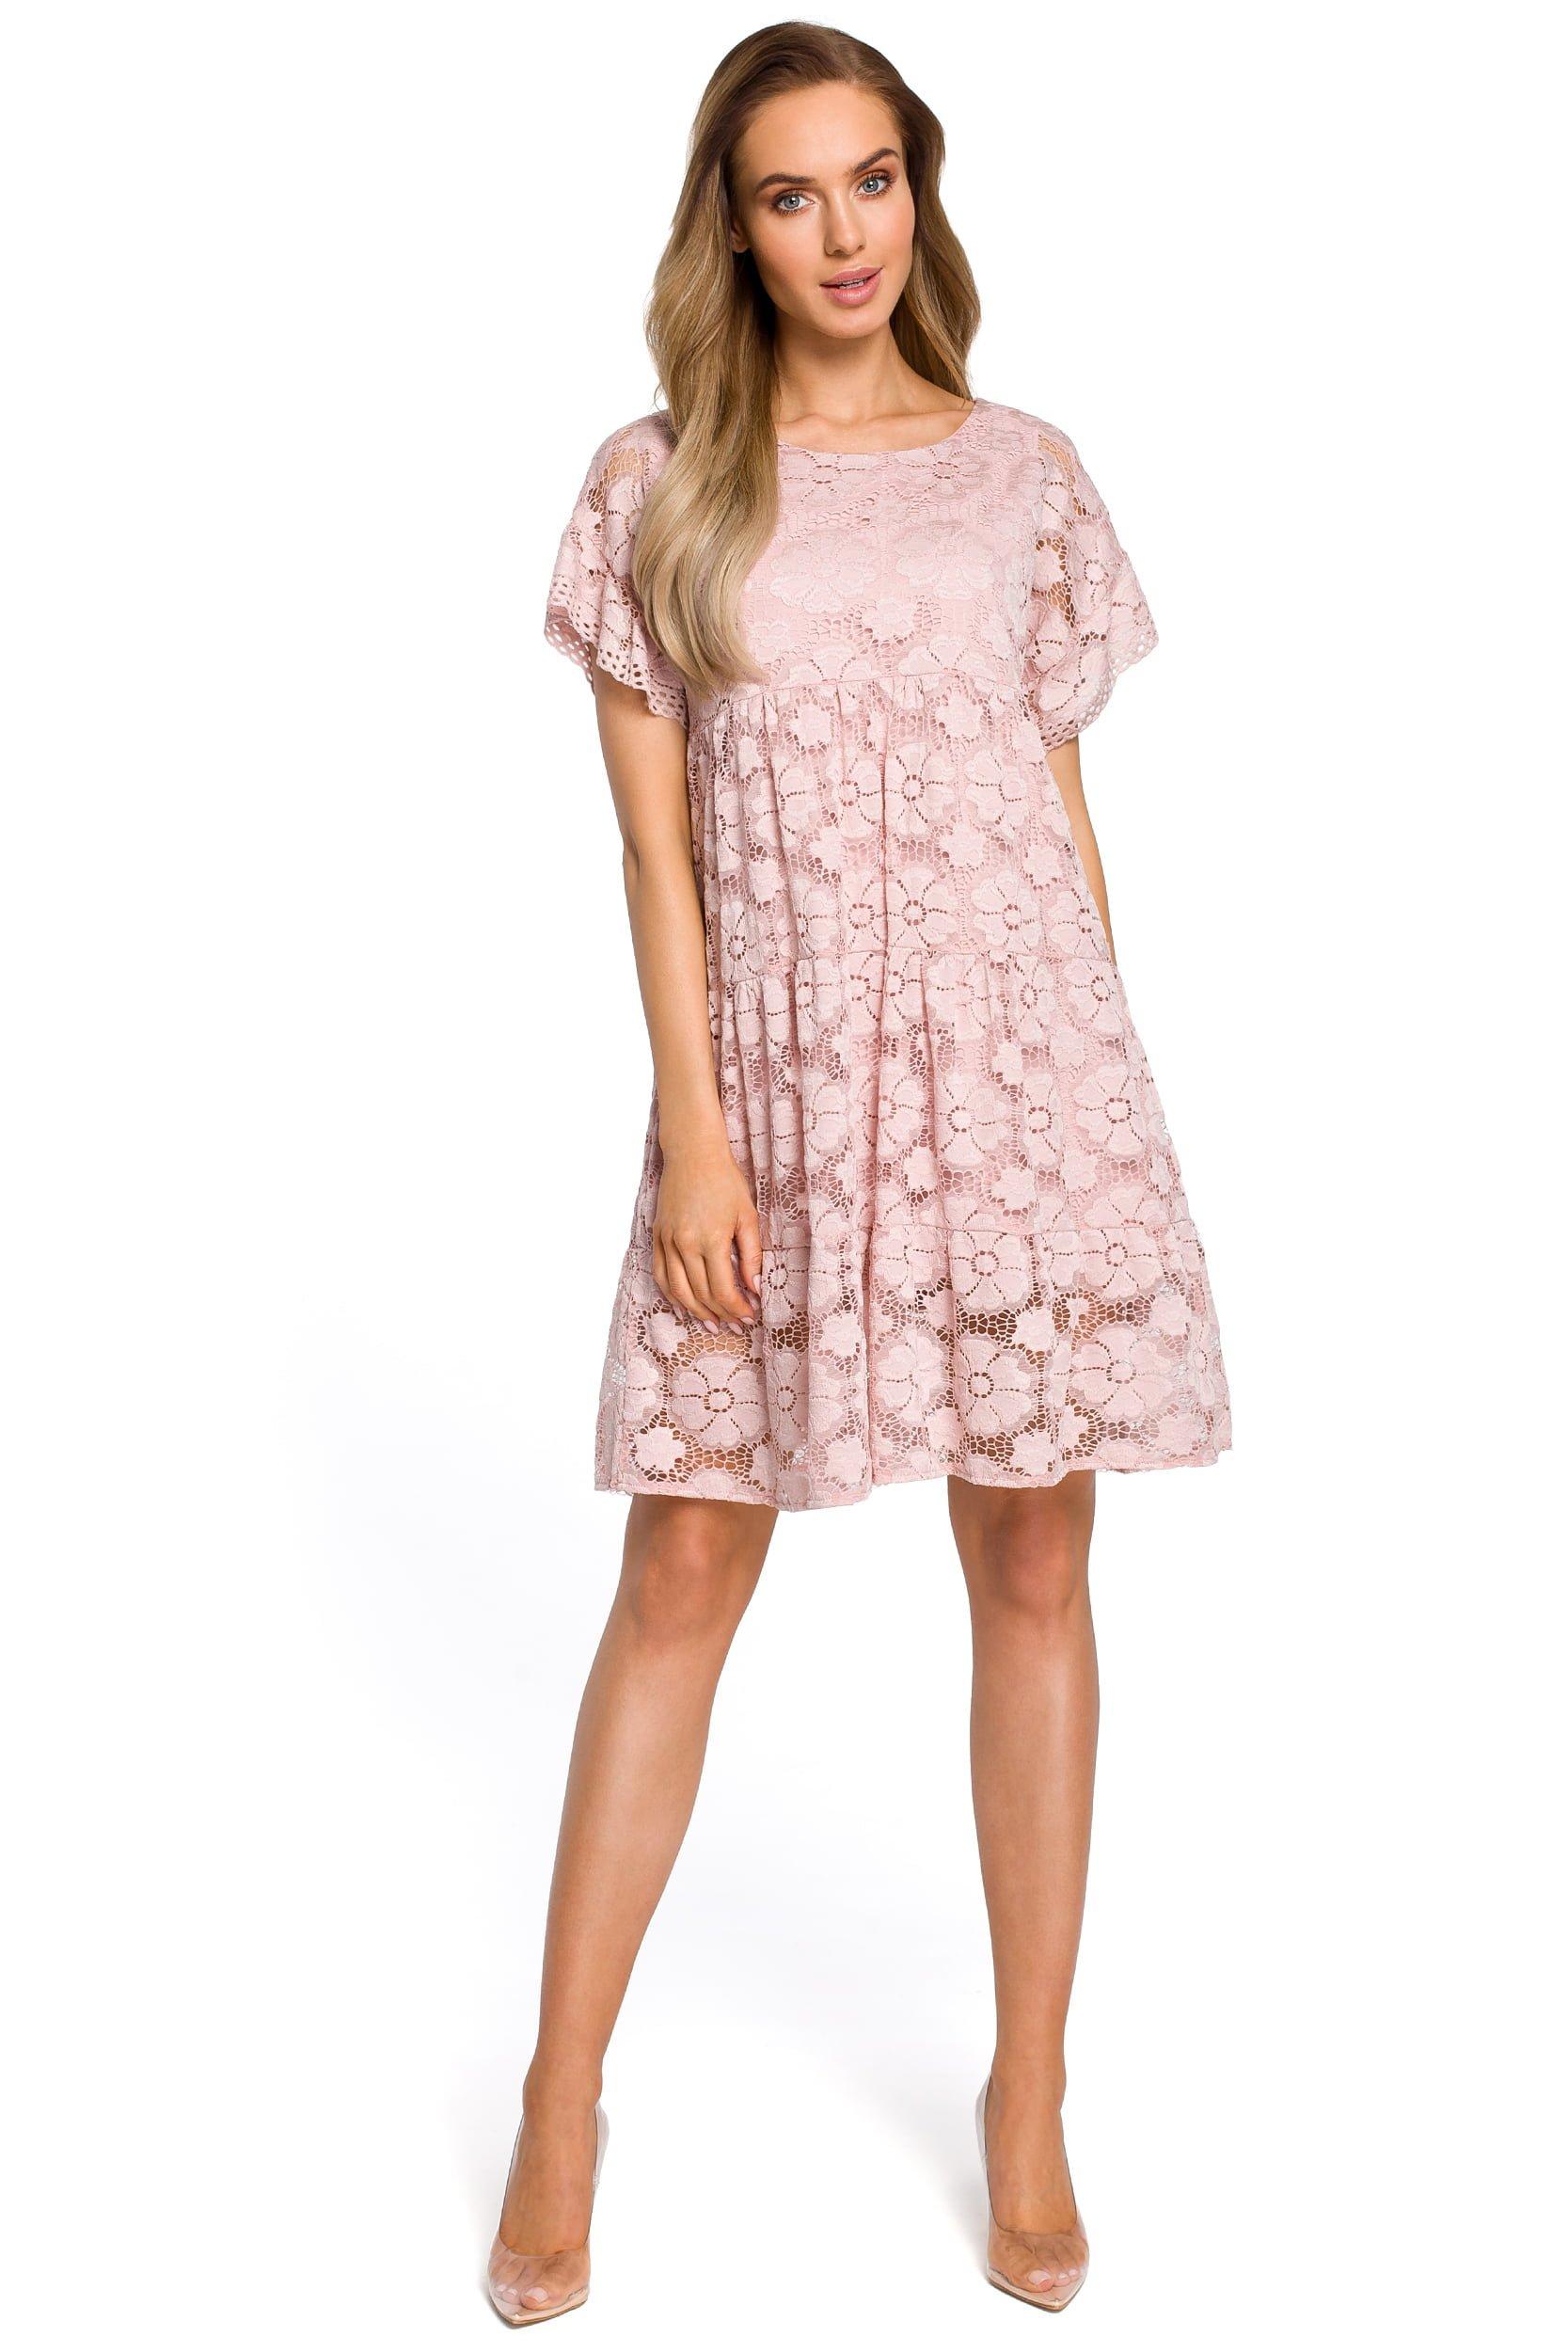 5edbb1d874 Luźna sukienka koronkowa - różowa - mavazi